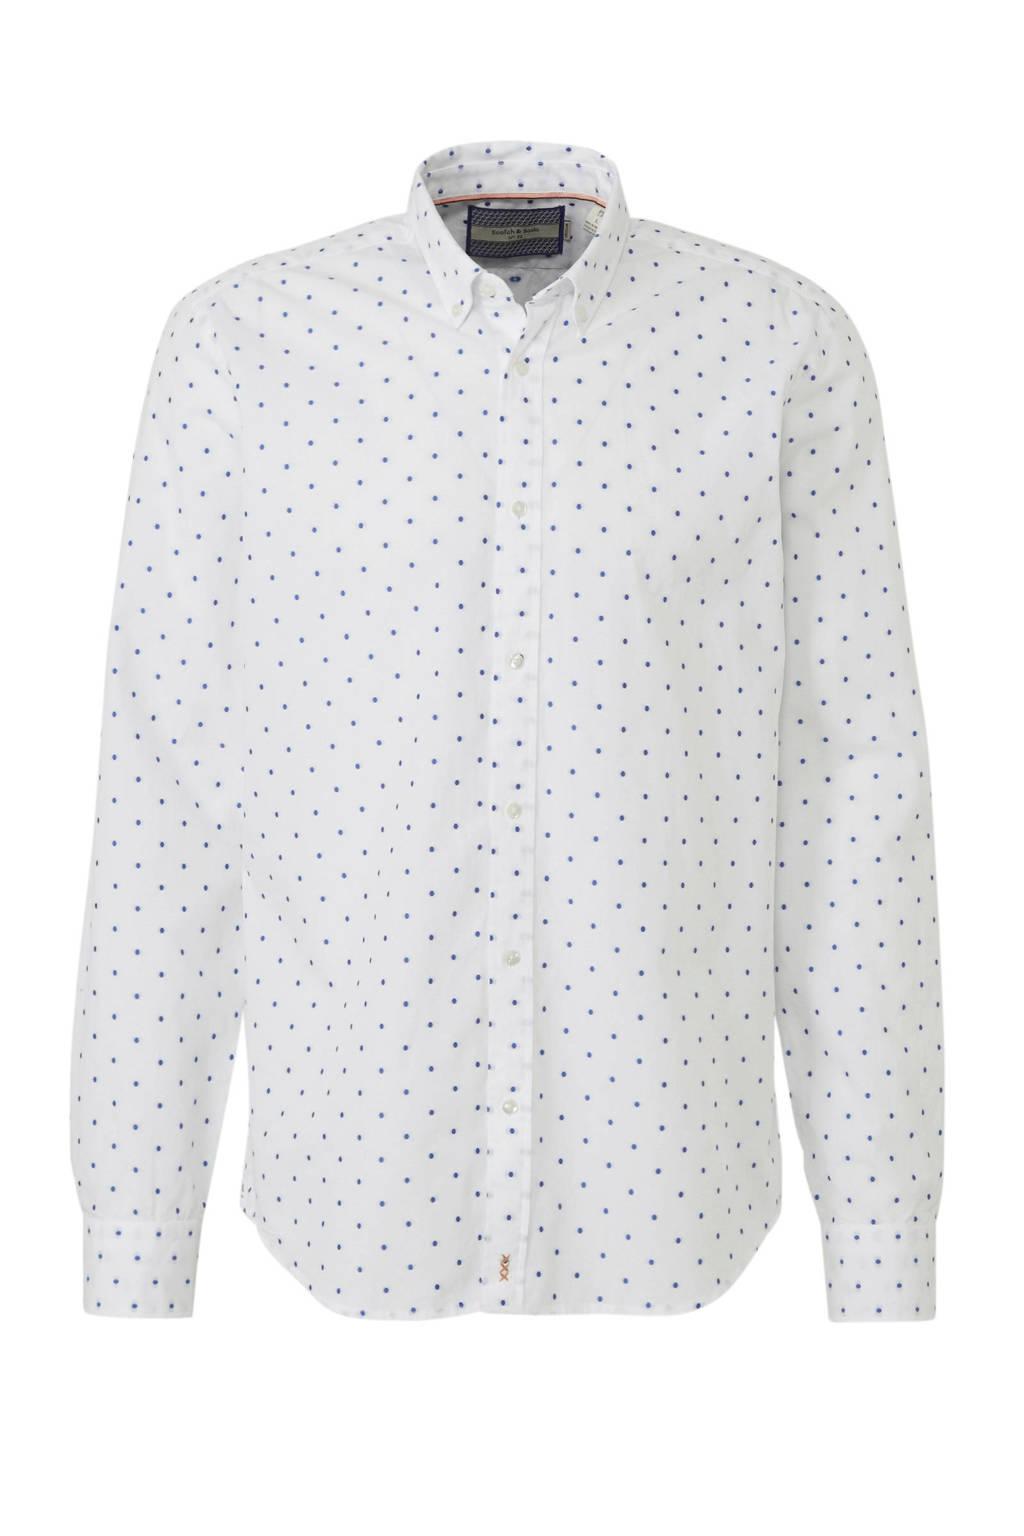 Scotch & Soda regular fit overhemd met print, Wit/blauw